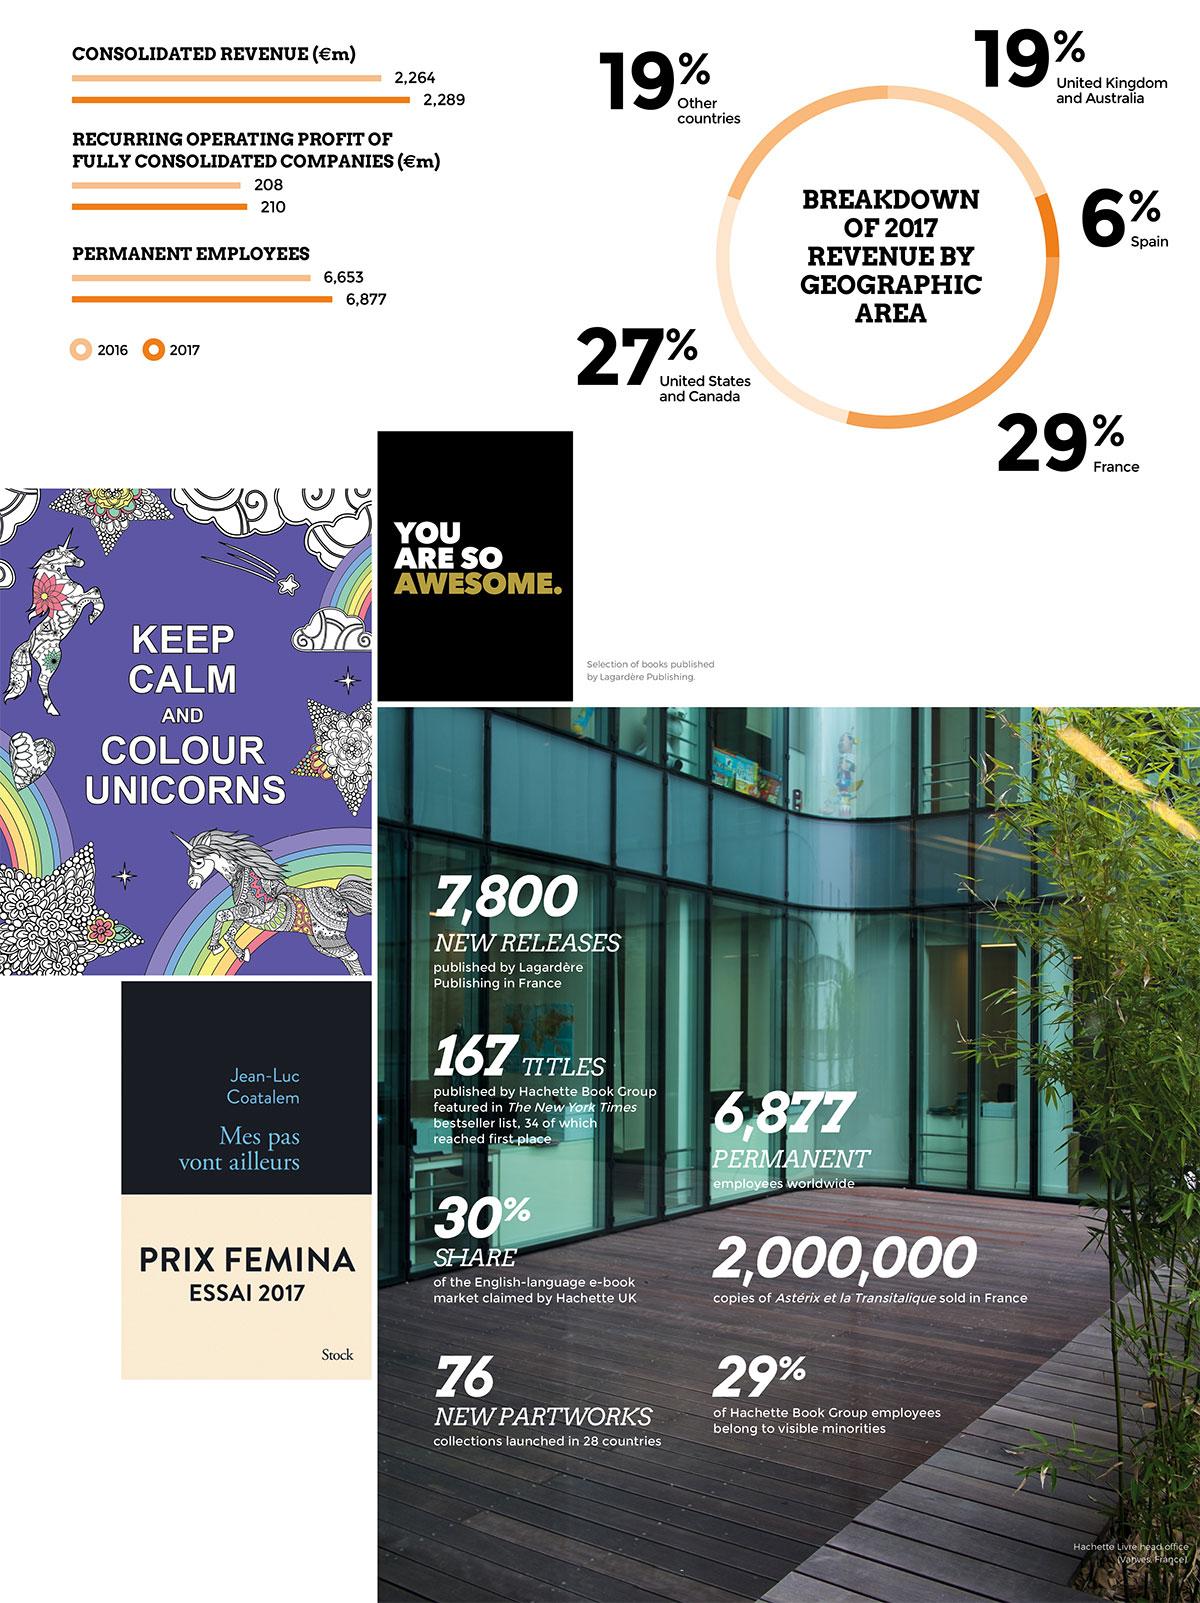 Lagardère Publishing: 2017 key figures